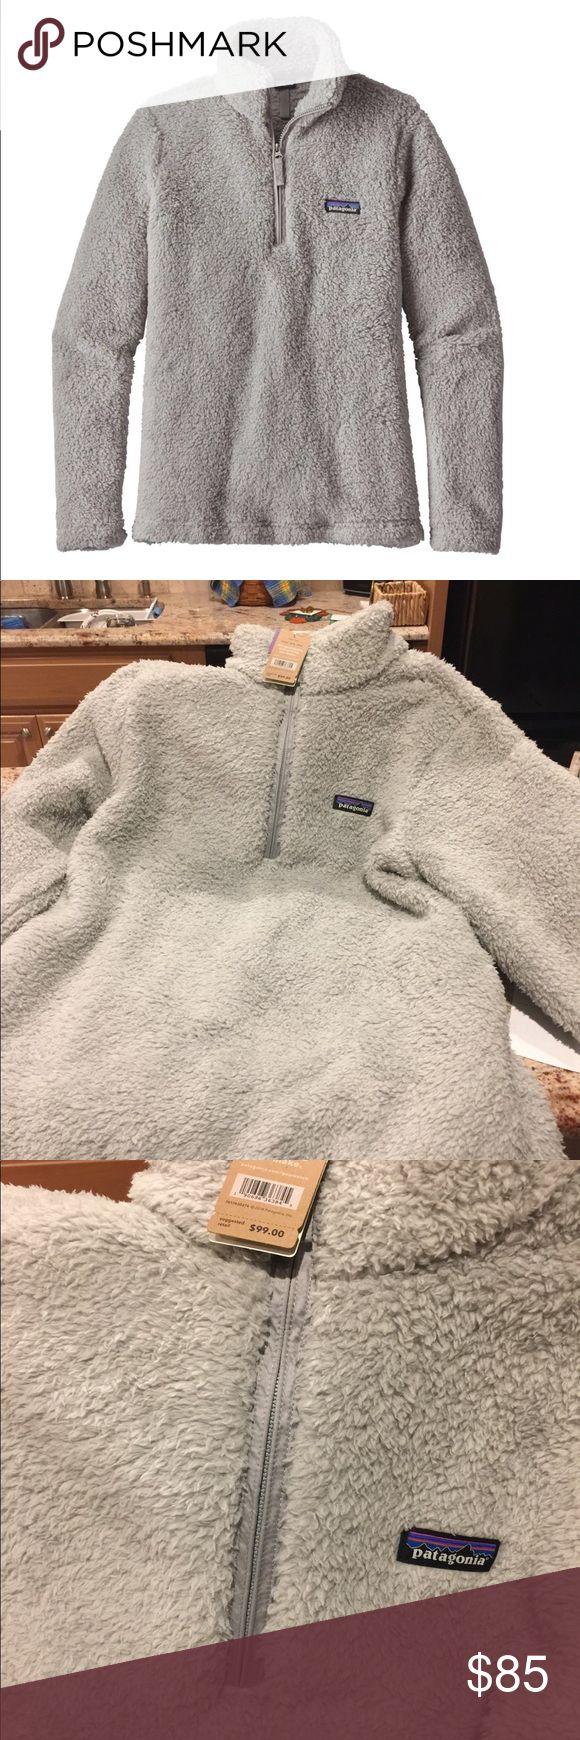 Patagonia Women's Los Gatos 1/4 Zip Fleece S XL New w tags Fleece Pullover Driftwood Grey XL Retail $99 Patagonia Jackets & Coats Vests